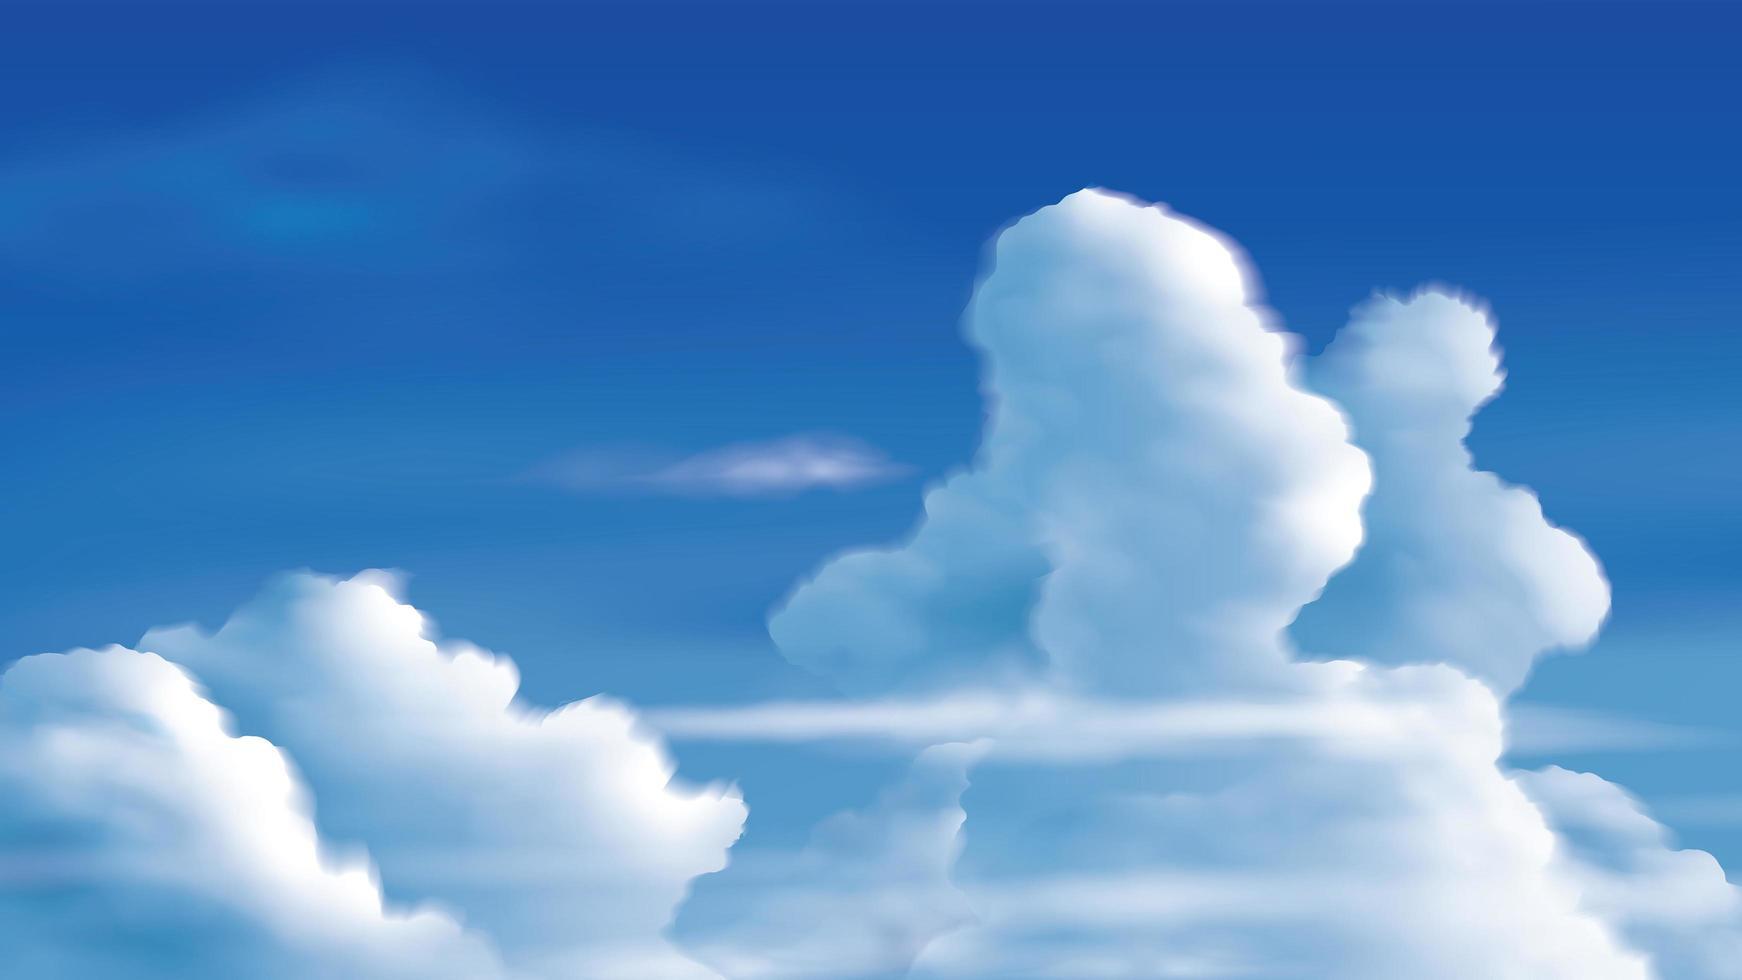 cumulonimbus sur le ciel bleu clair vecteur